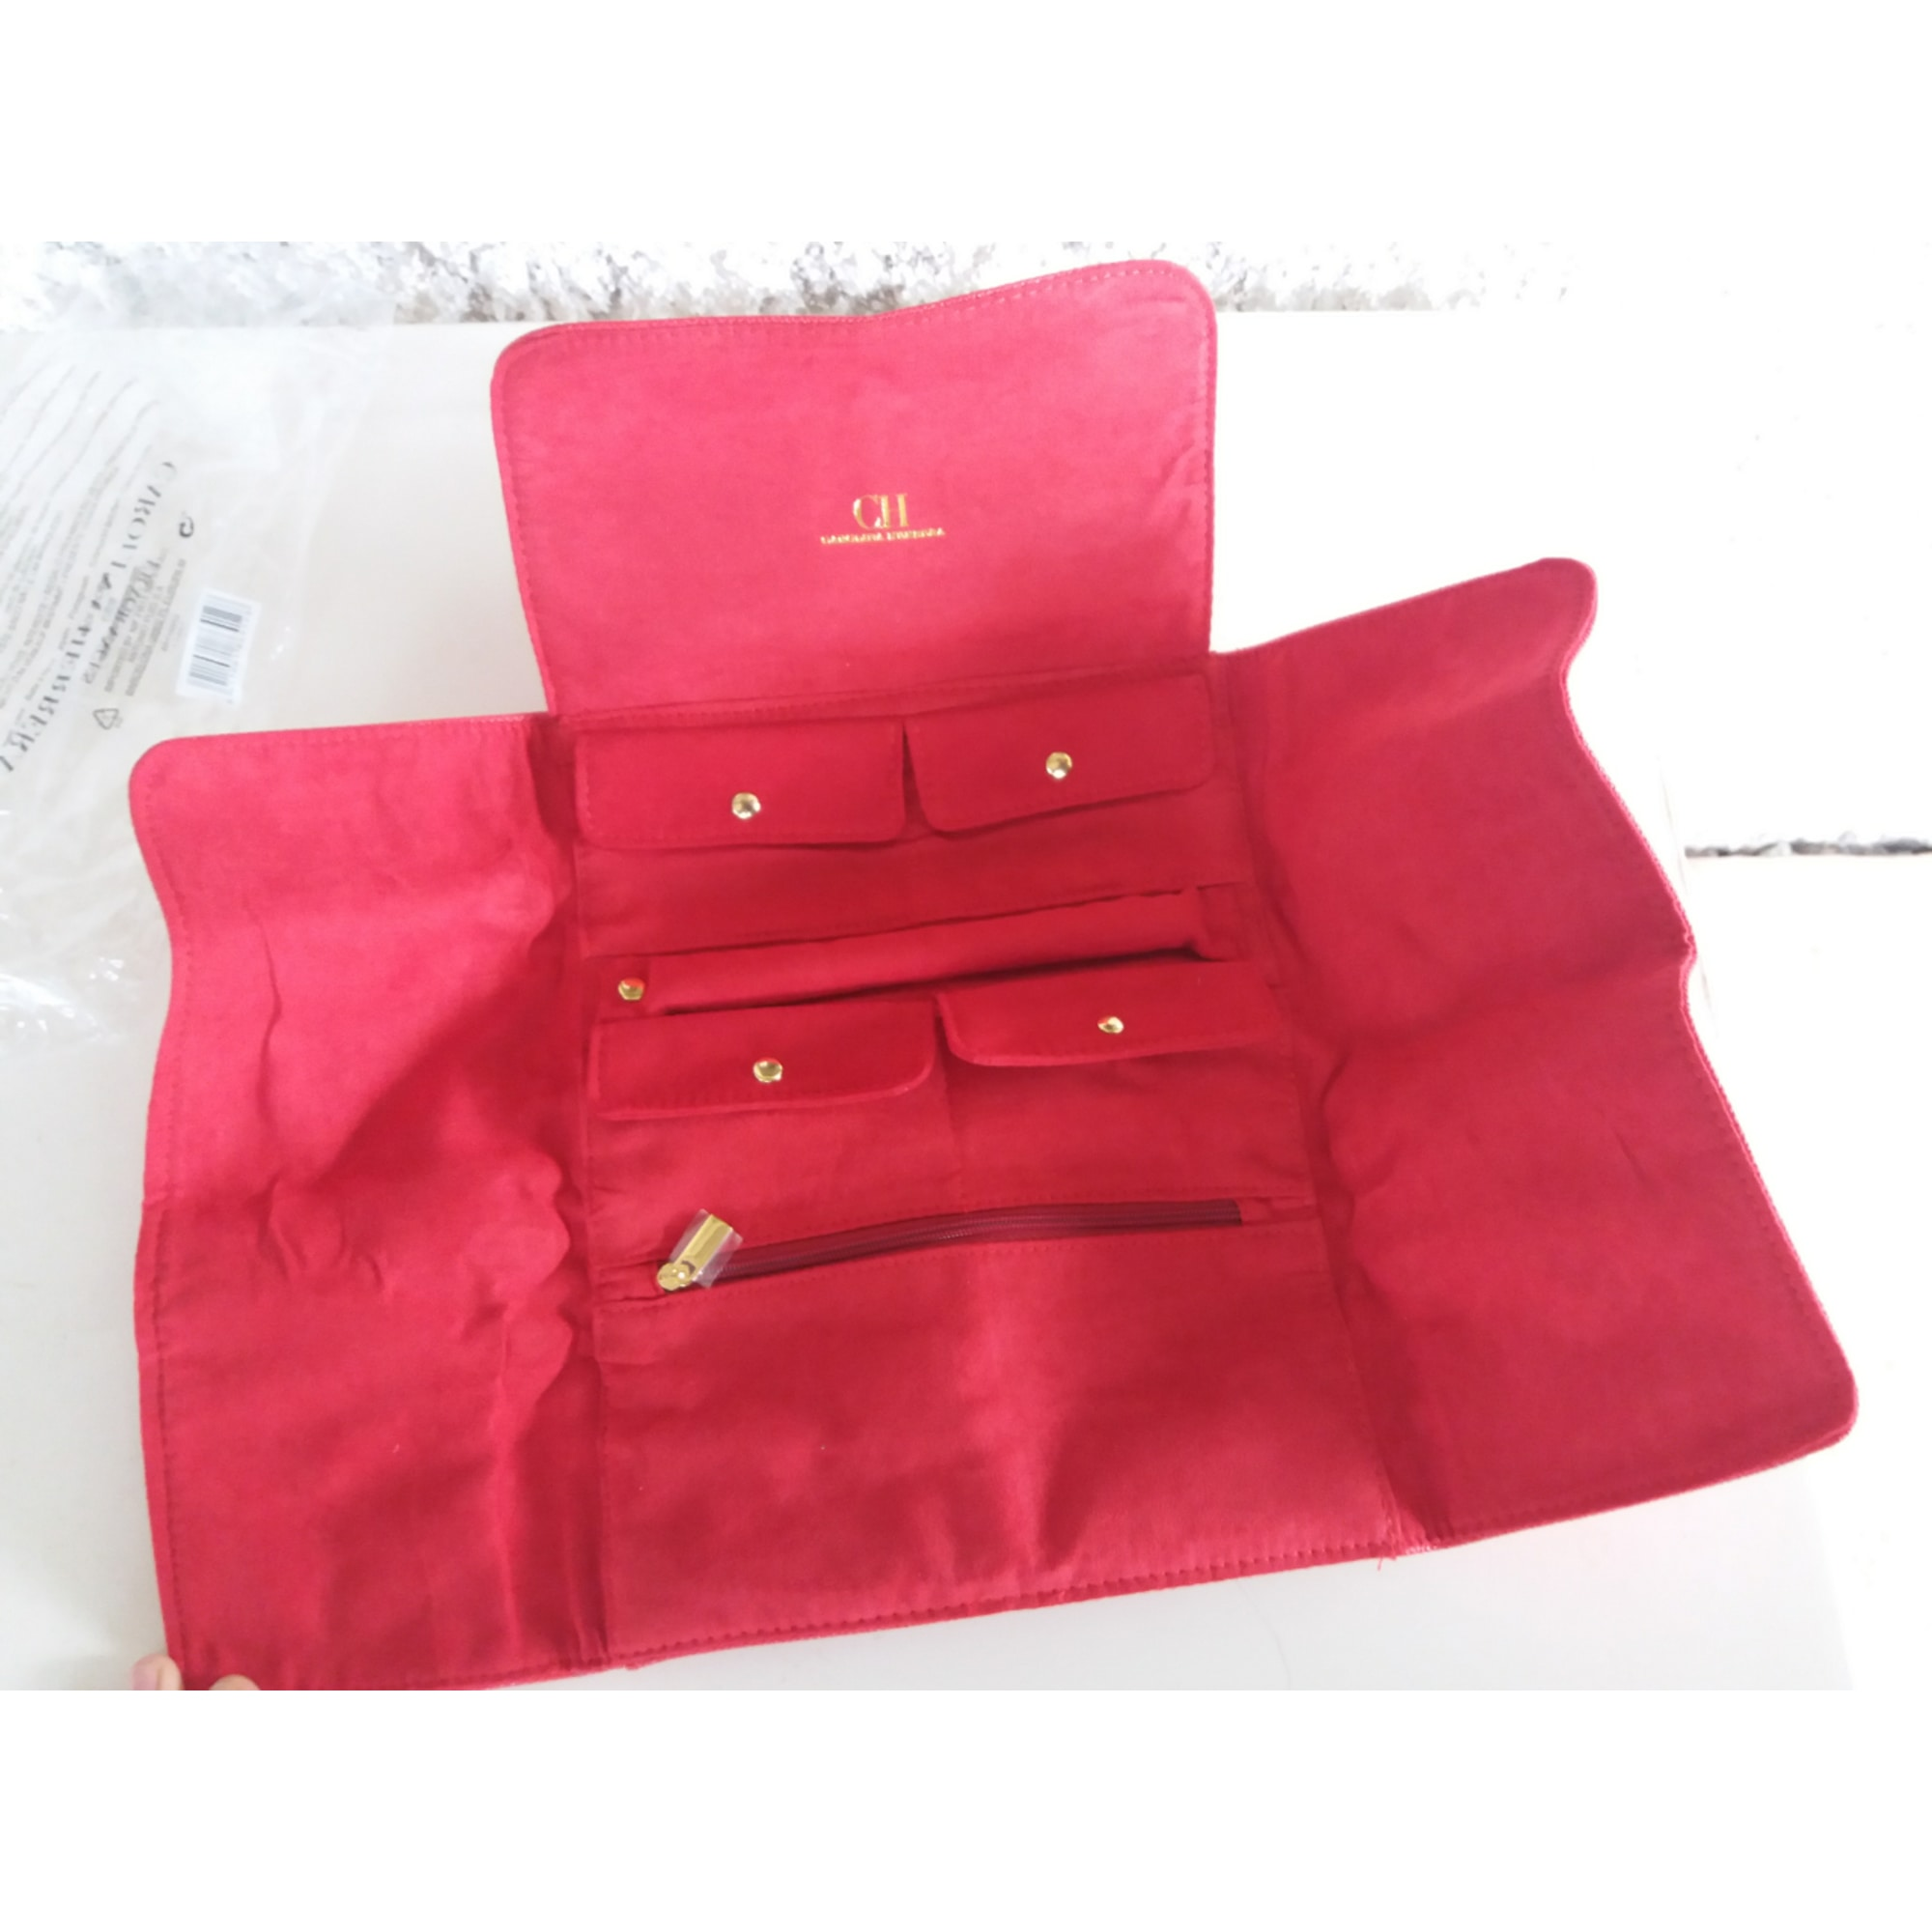 Sacoche CAROLINA HERRERA simili cuir verni rouge